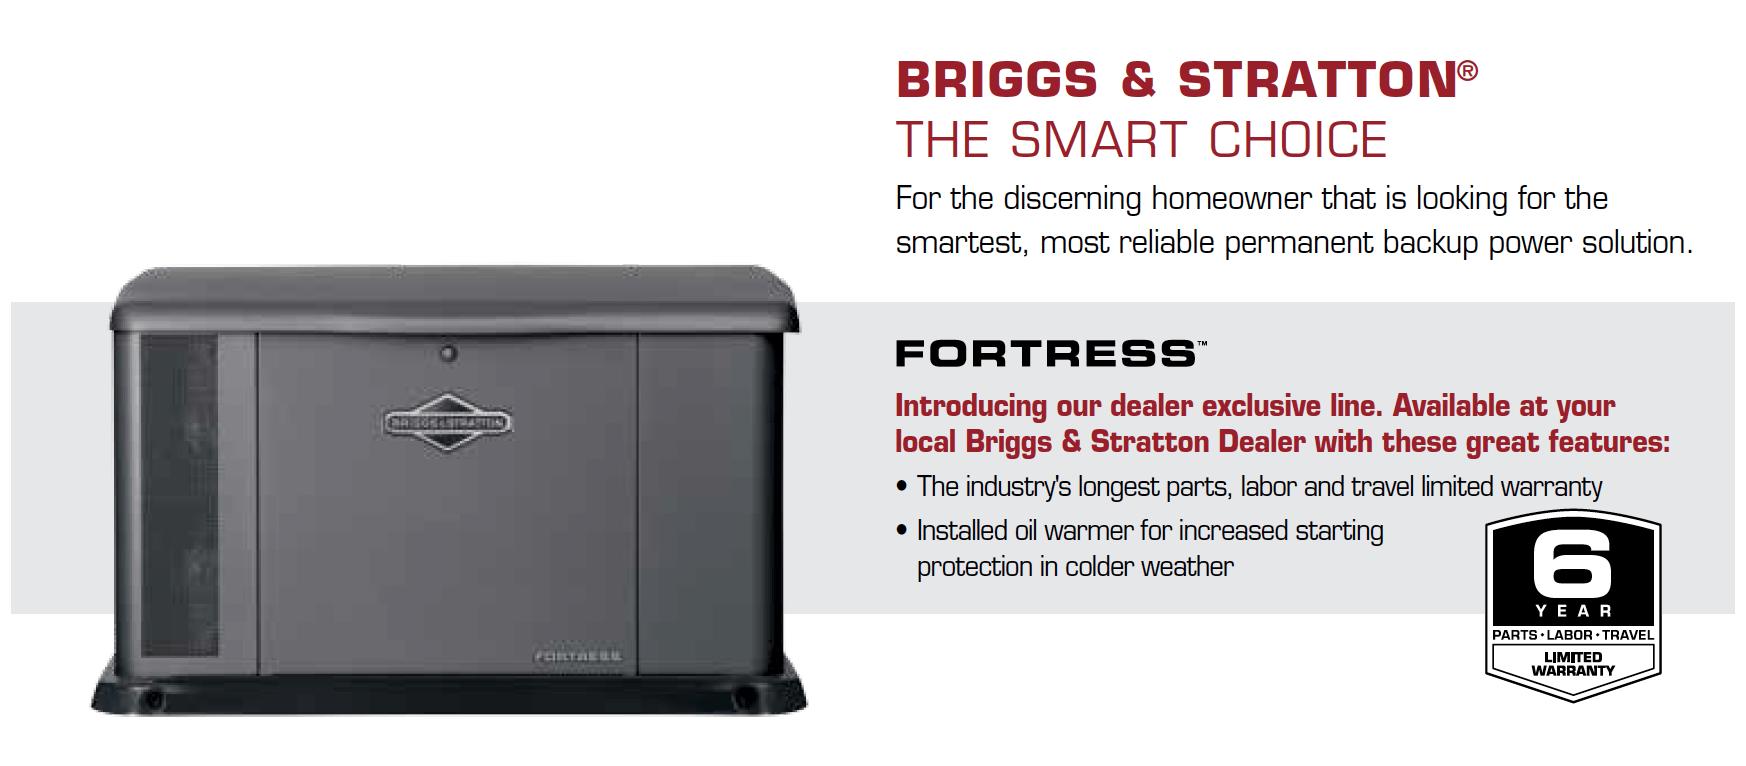 Briggs & Stratton 20 kW Fortress Home Generator System - Bay